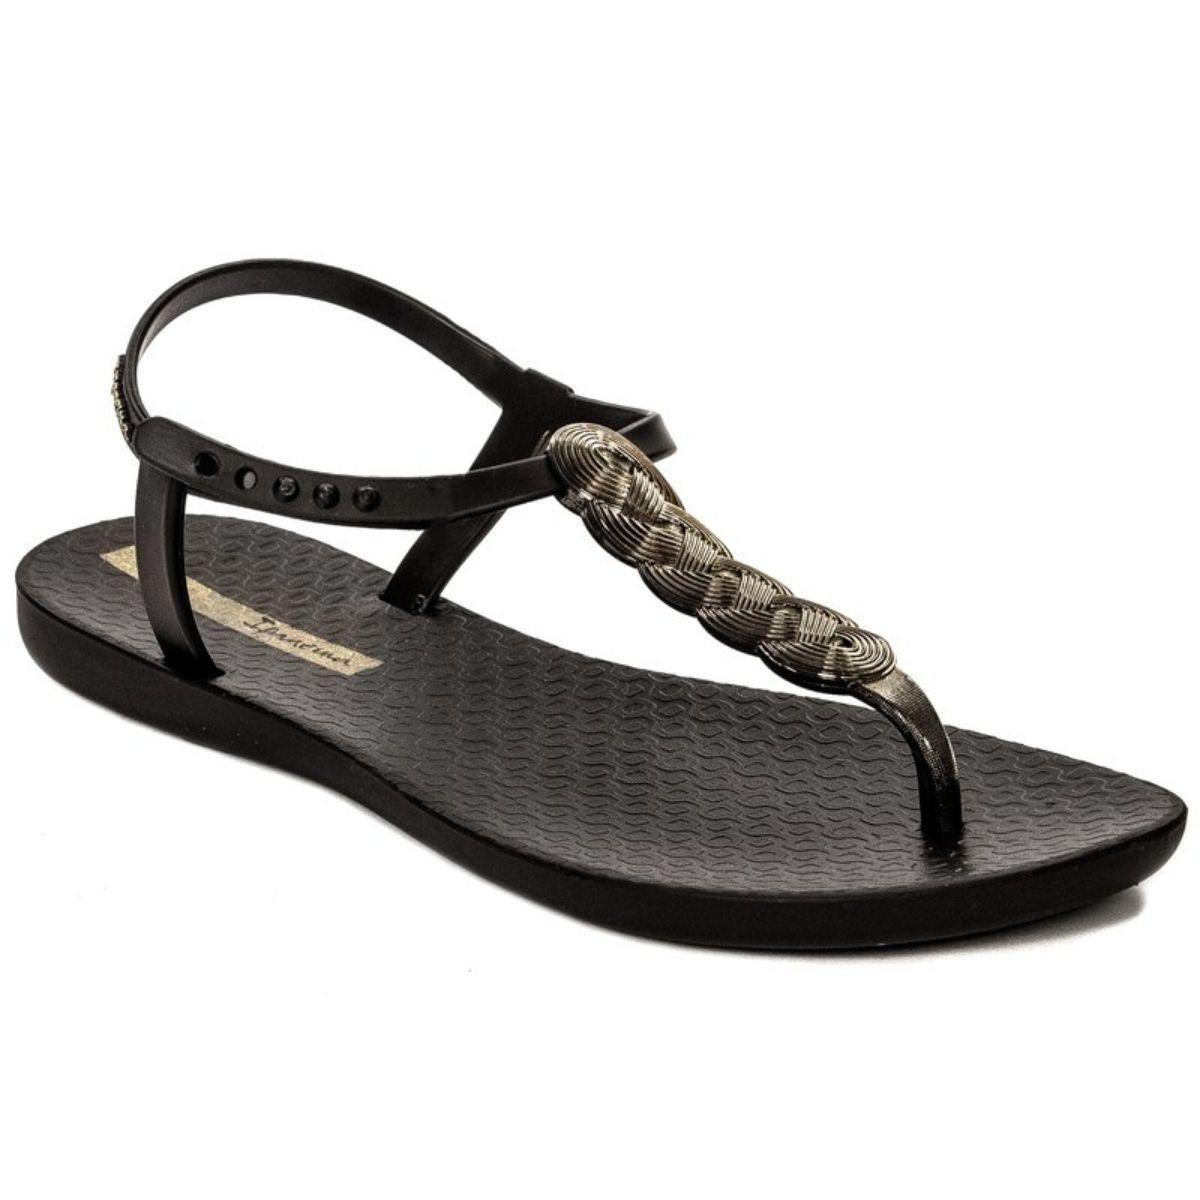 Sandalo Ipanema Infradito...